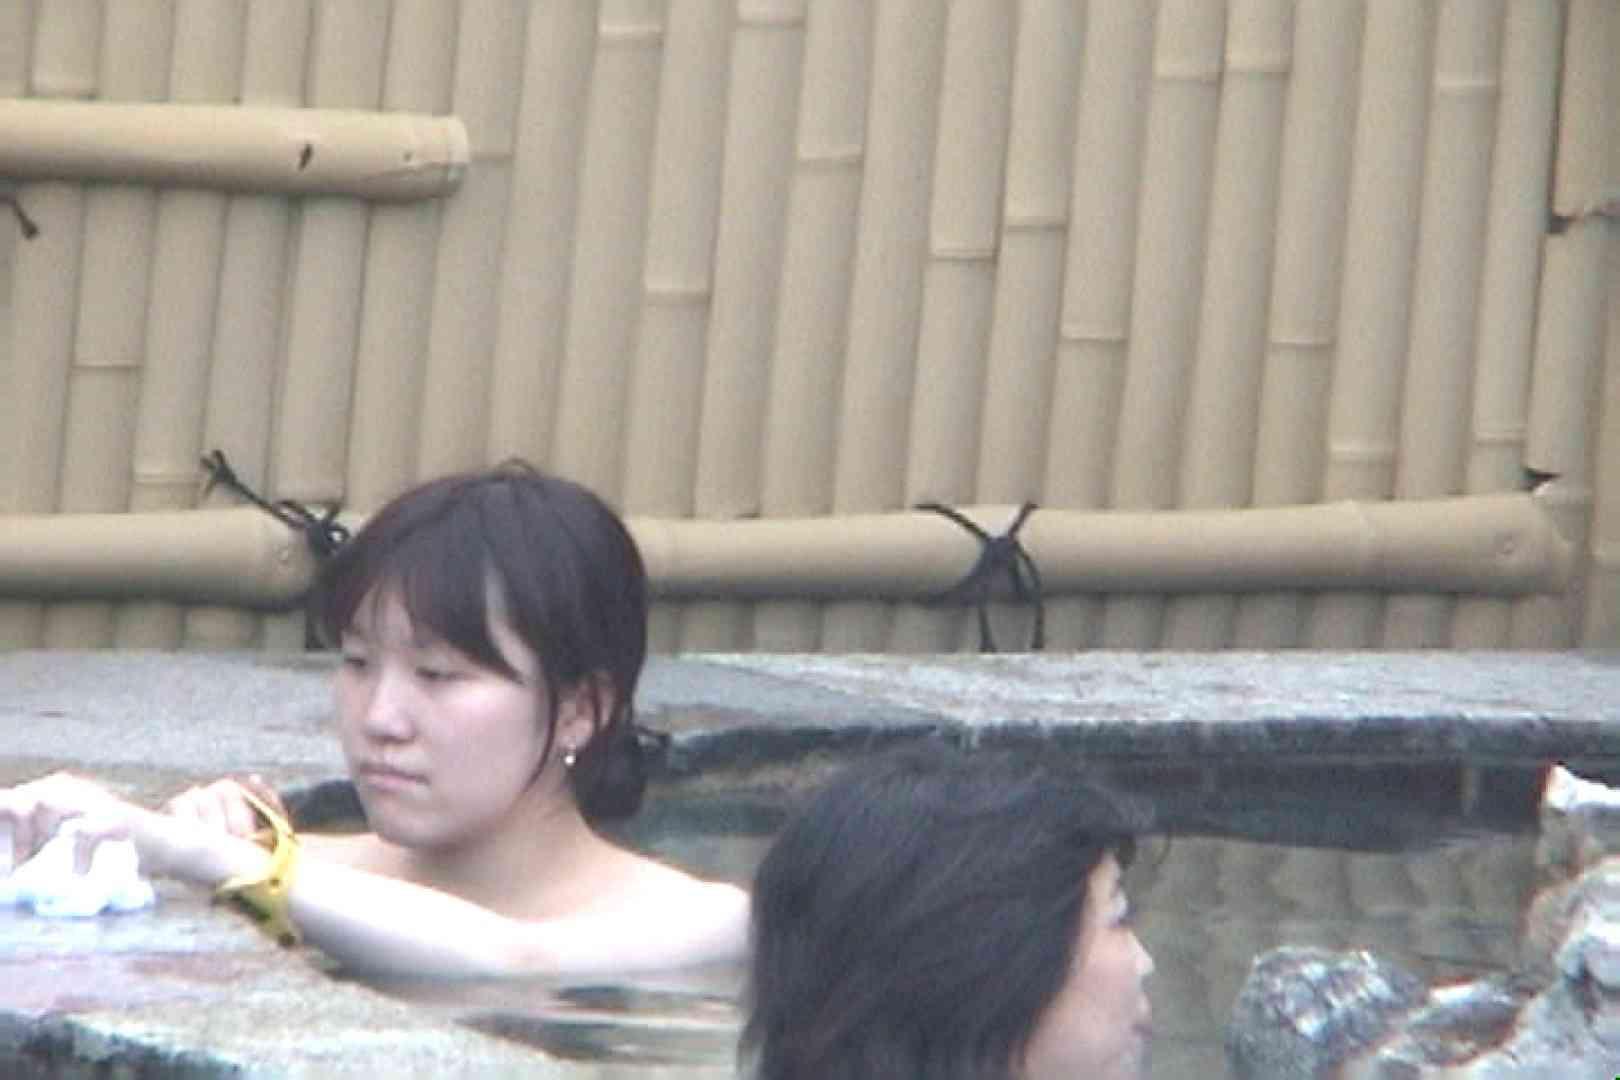 Aquaな露天風呂Vol.79【VIP限定】 盗撮 | HなOL  100pic 90